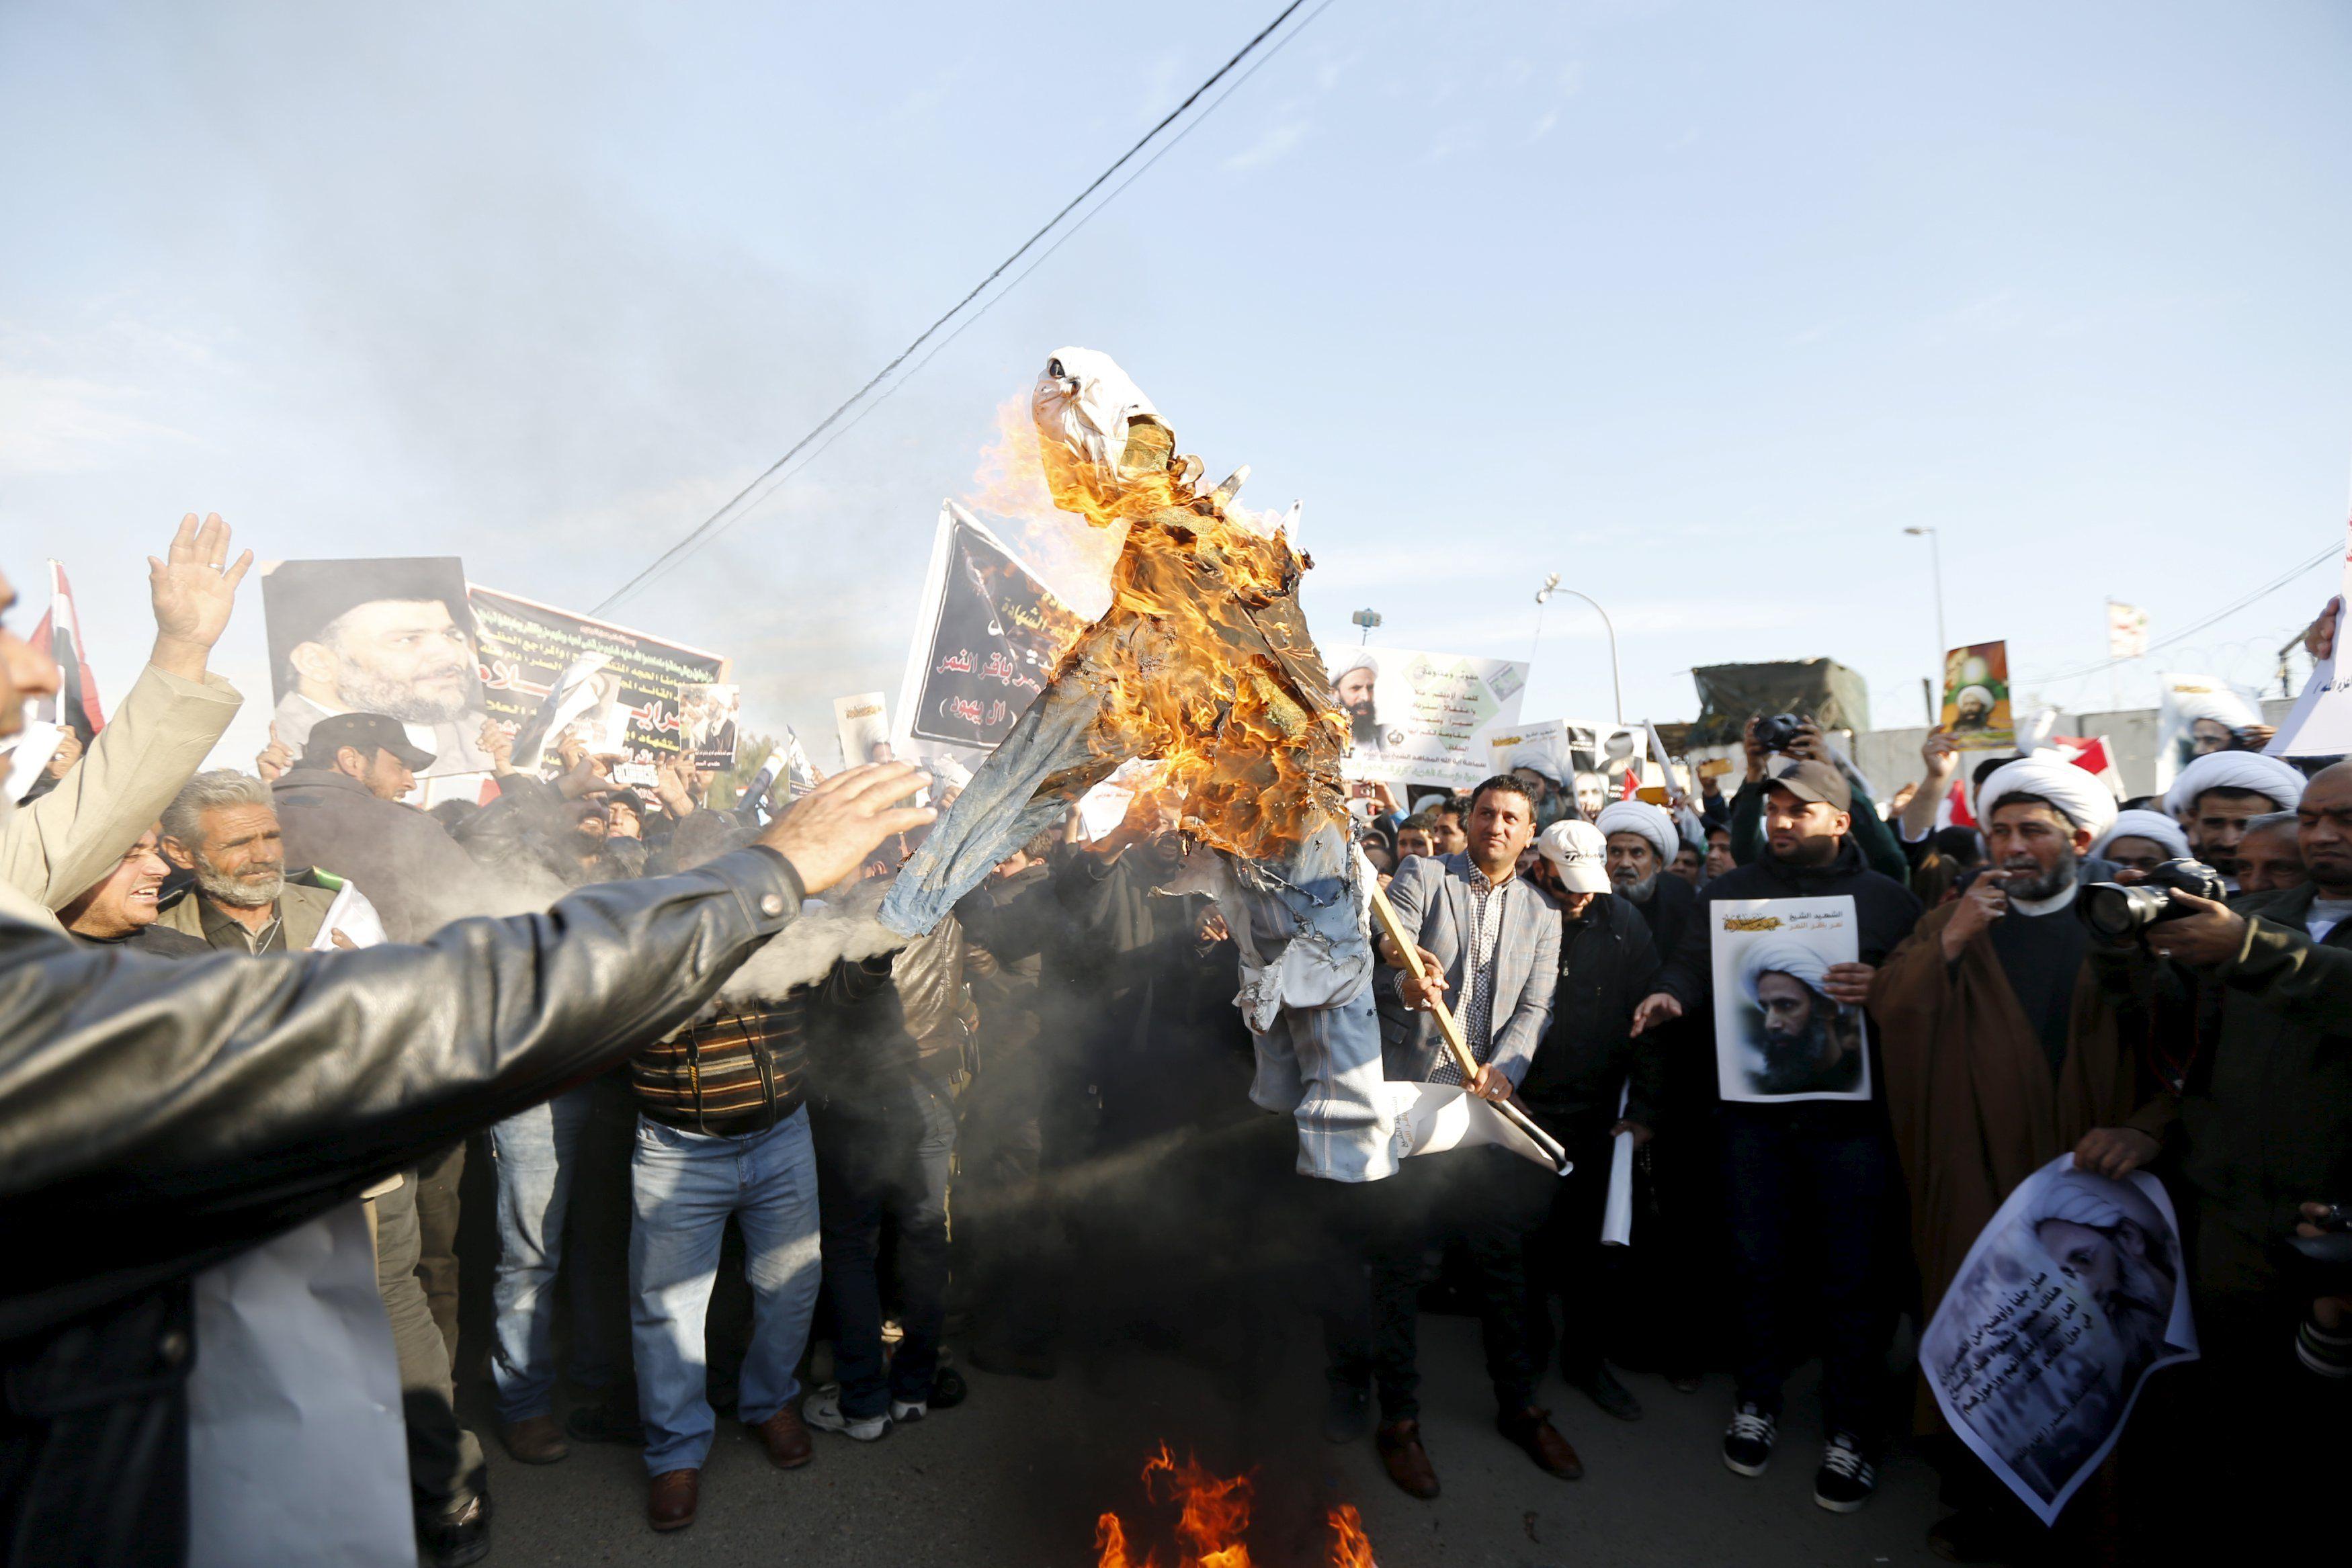 Акция протеста против казни шейха Нимра аль-Нимра